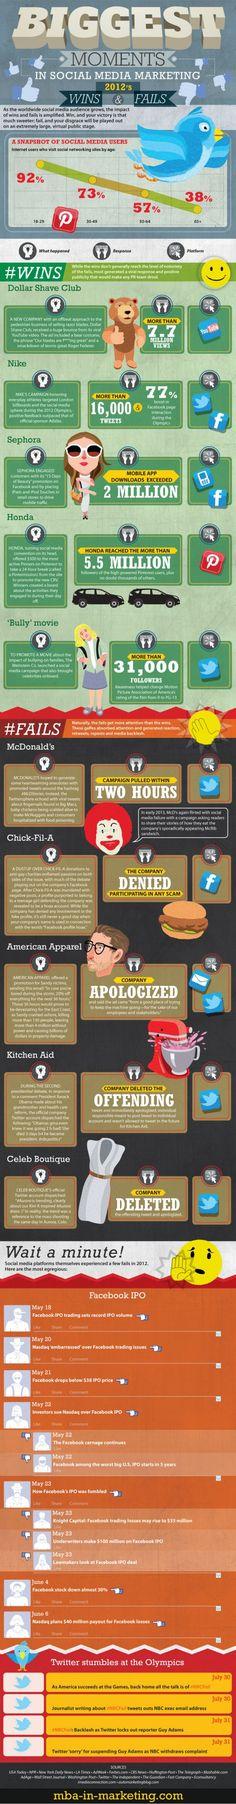 Social Media Marketing 2012: Tops und Flops #infographic